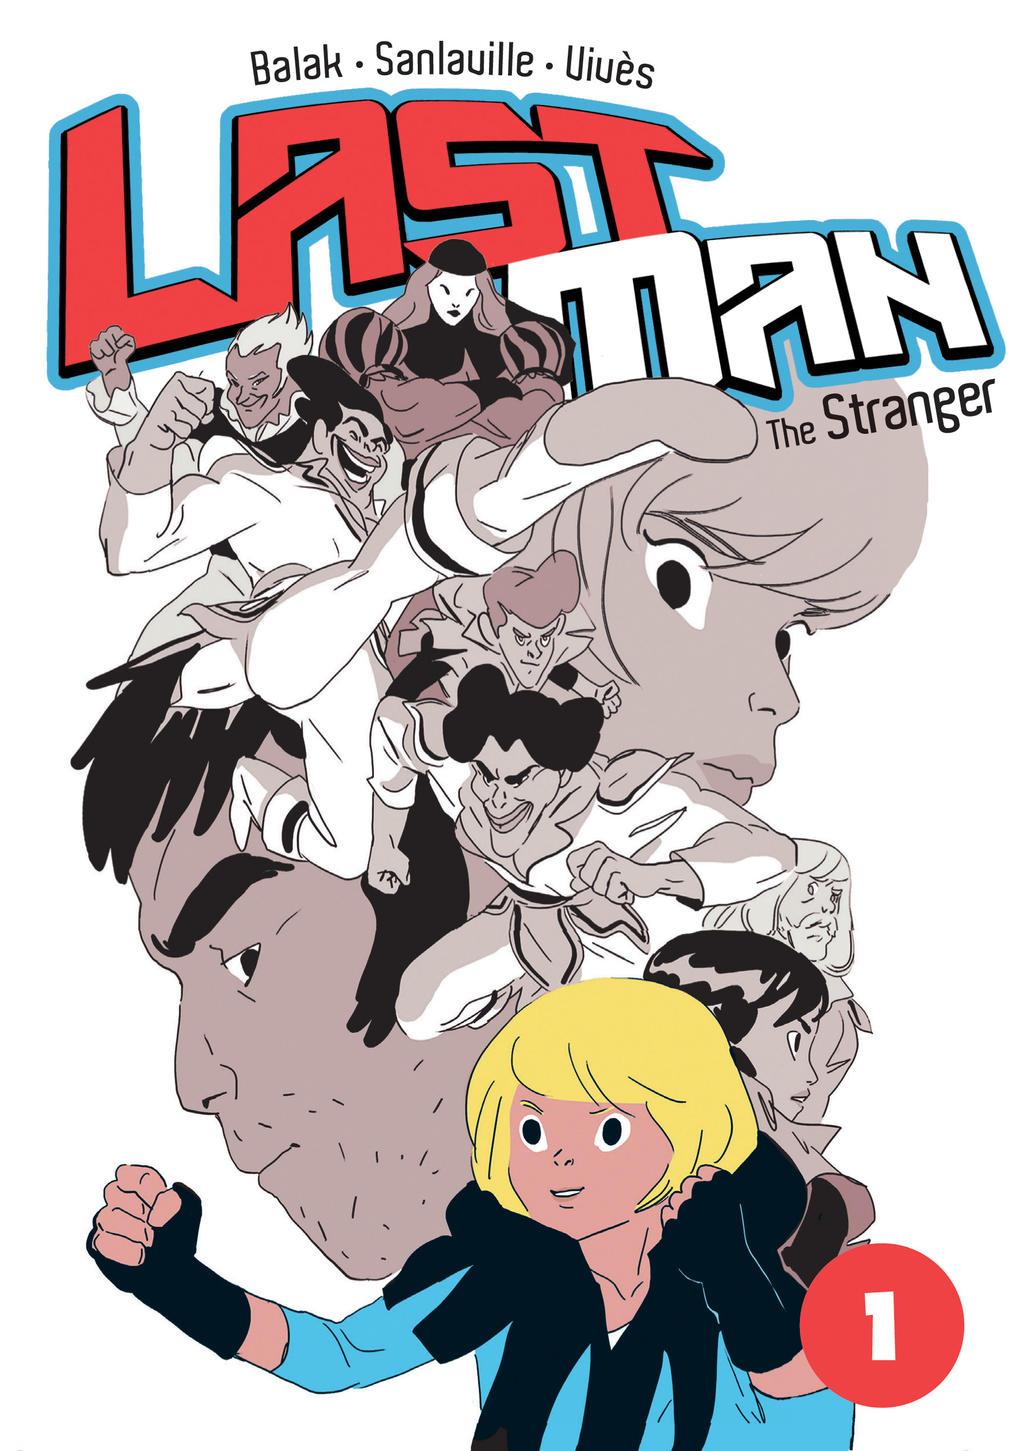 Last-Man-The-Stranger-2-26-15 by Balak01